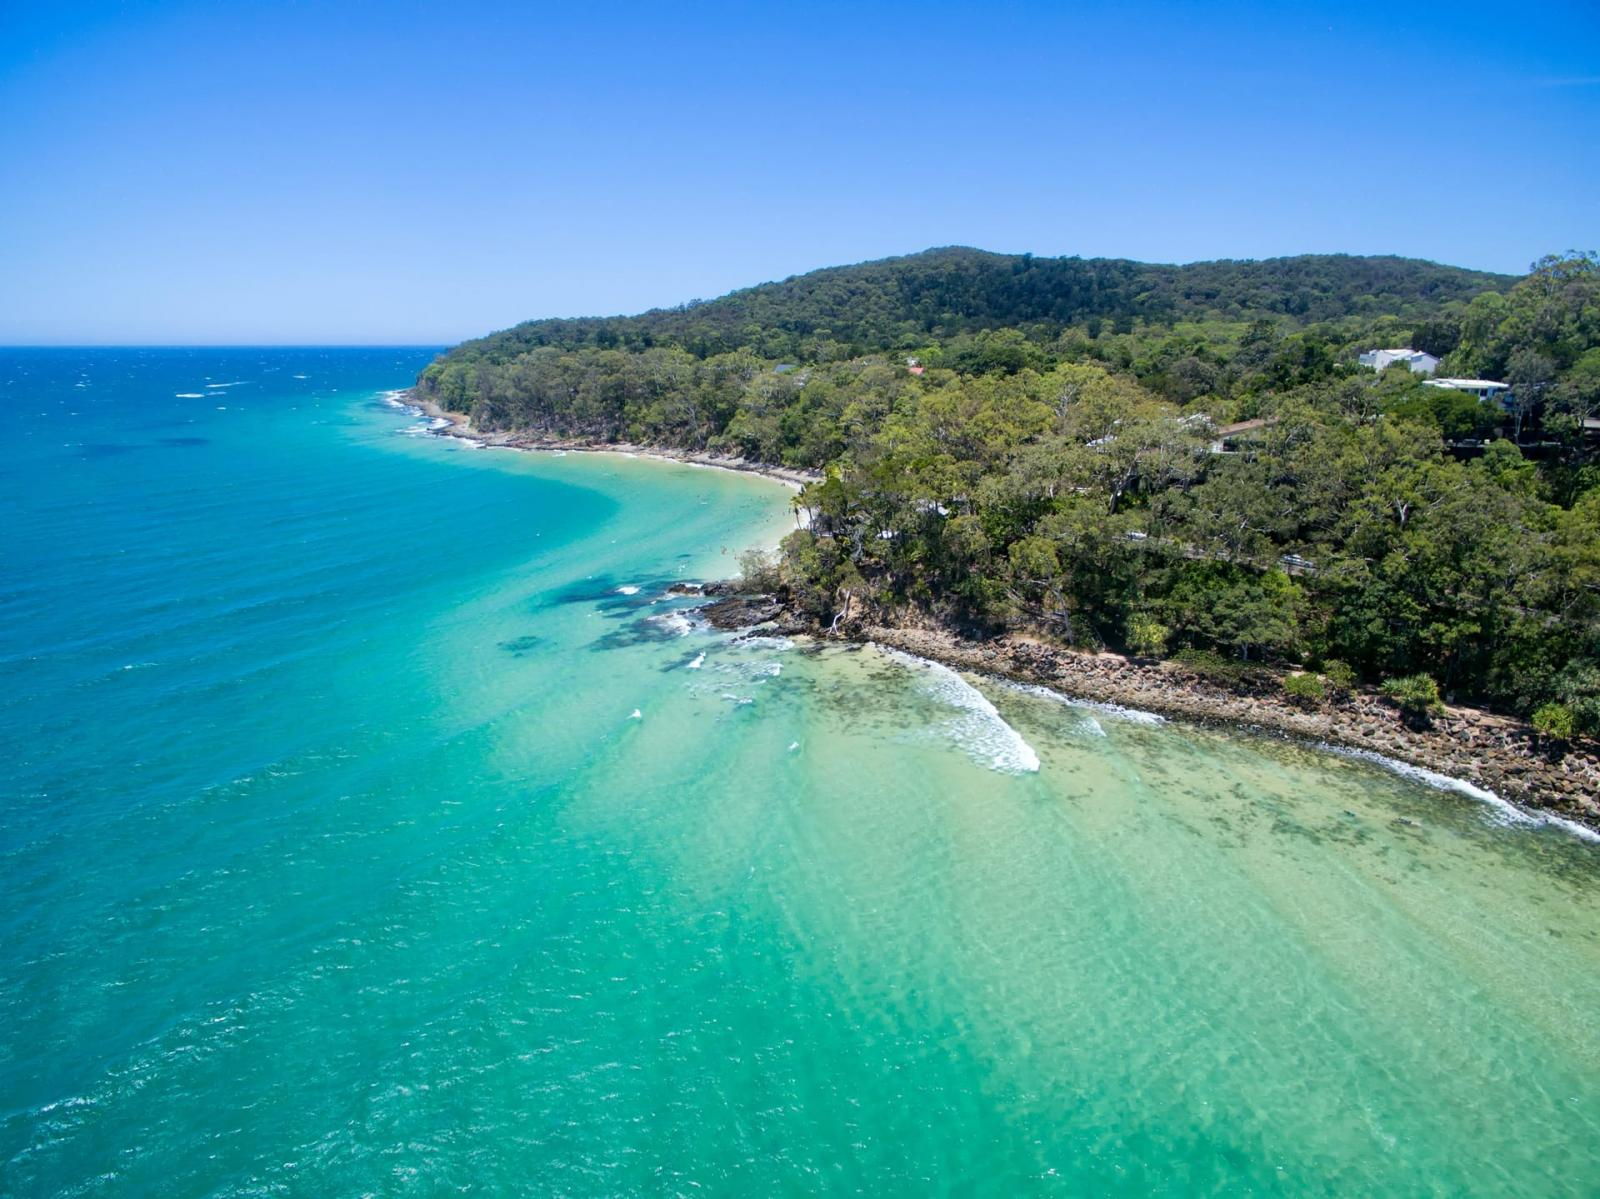 Noosa Australien